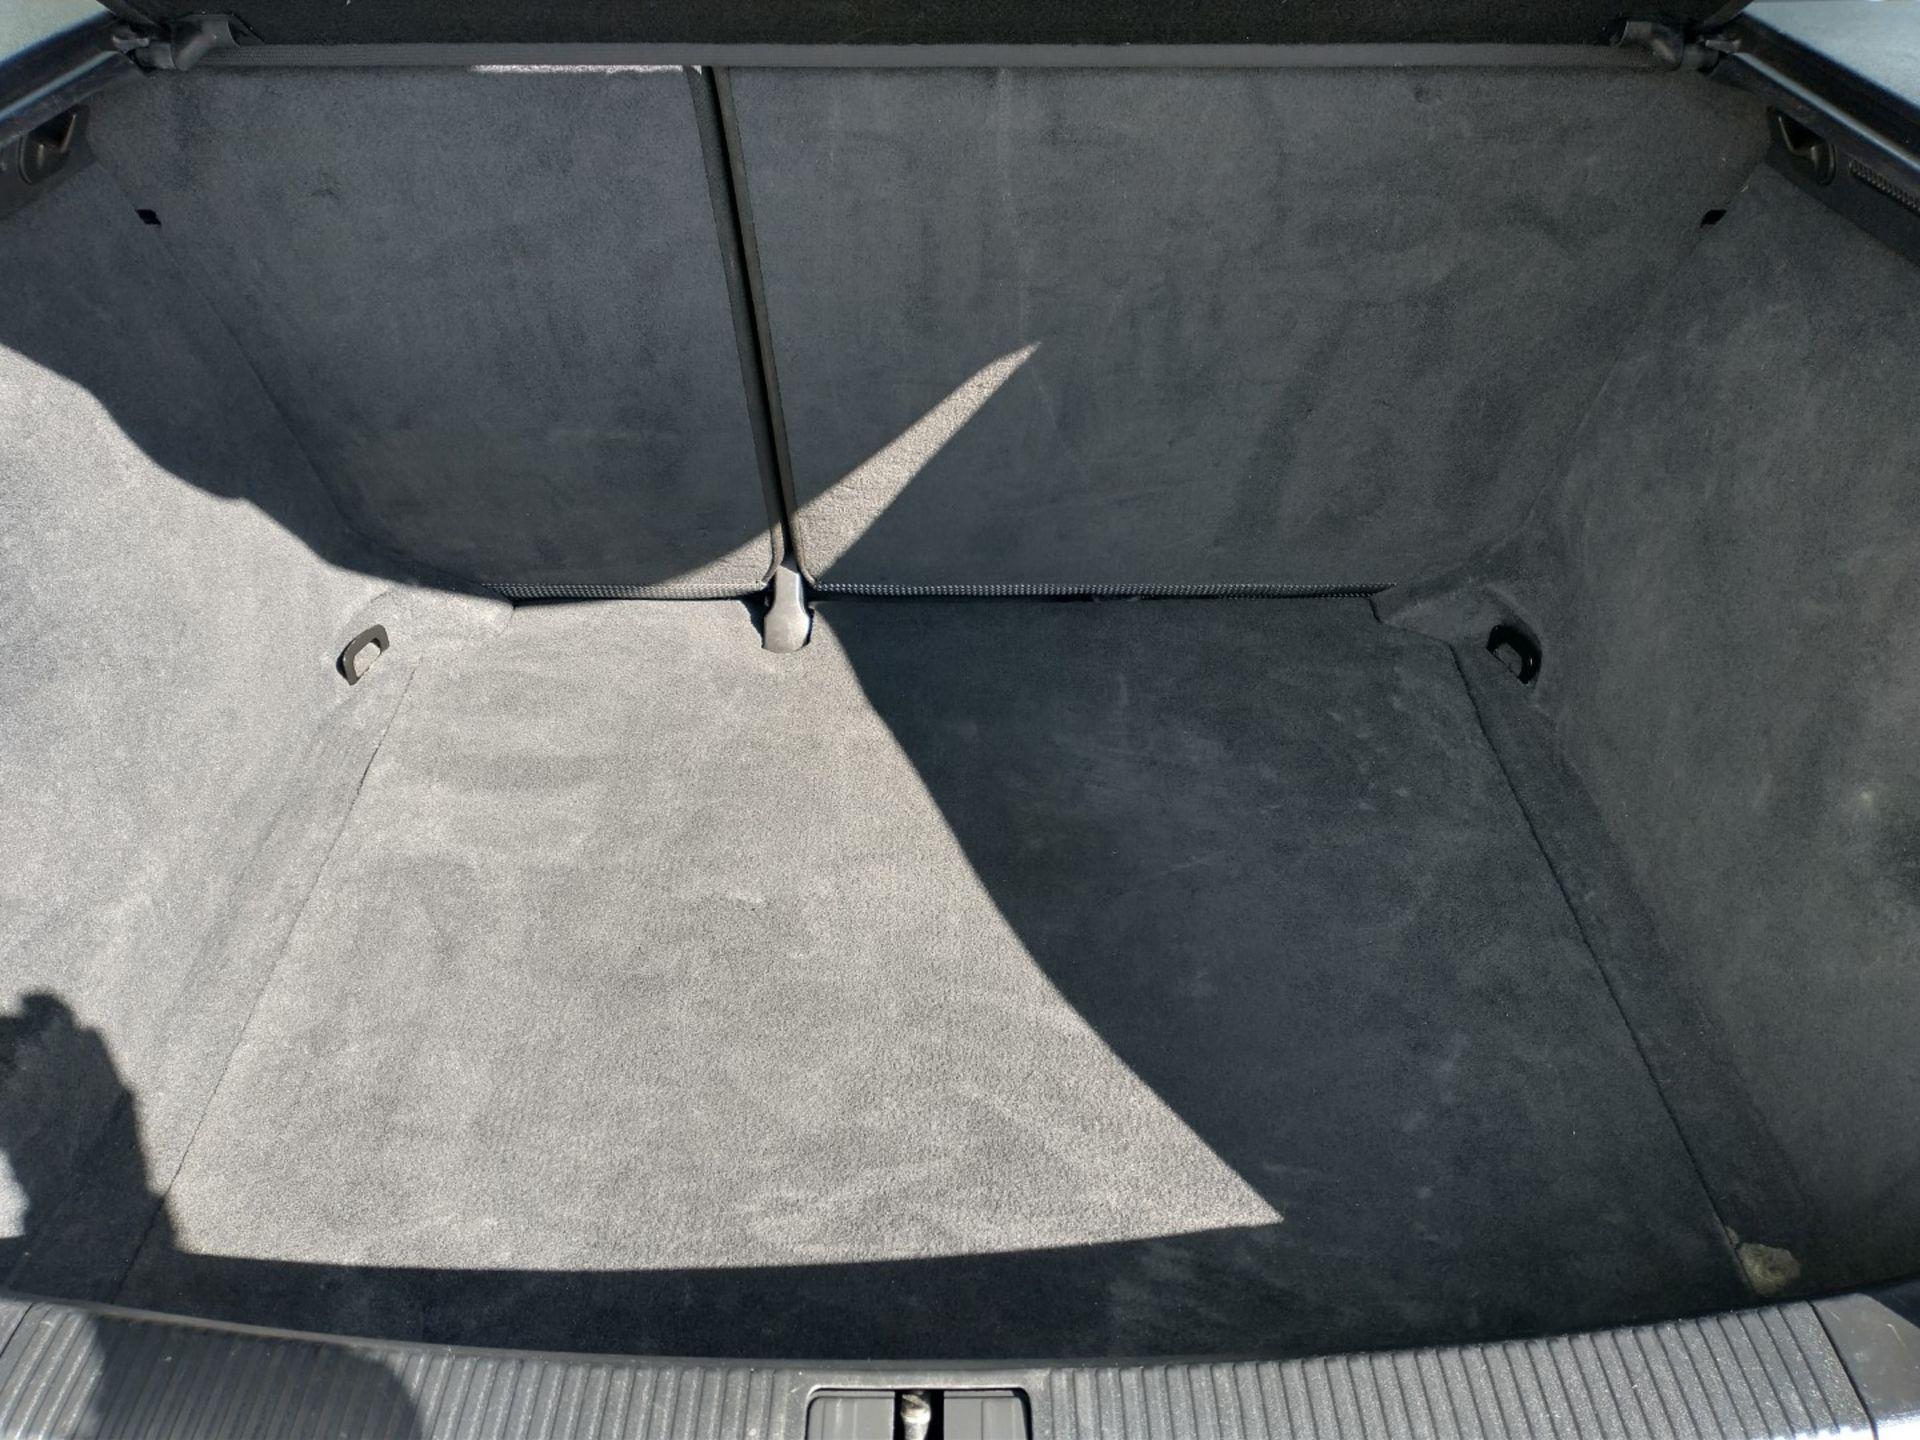 2012 Audi A3 Sportback 1.6 Tdi Hatchback - Full Service History - CL505 - NO VAT ON THE HAMMER - - Image 10 of 26